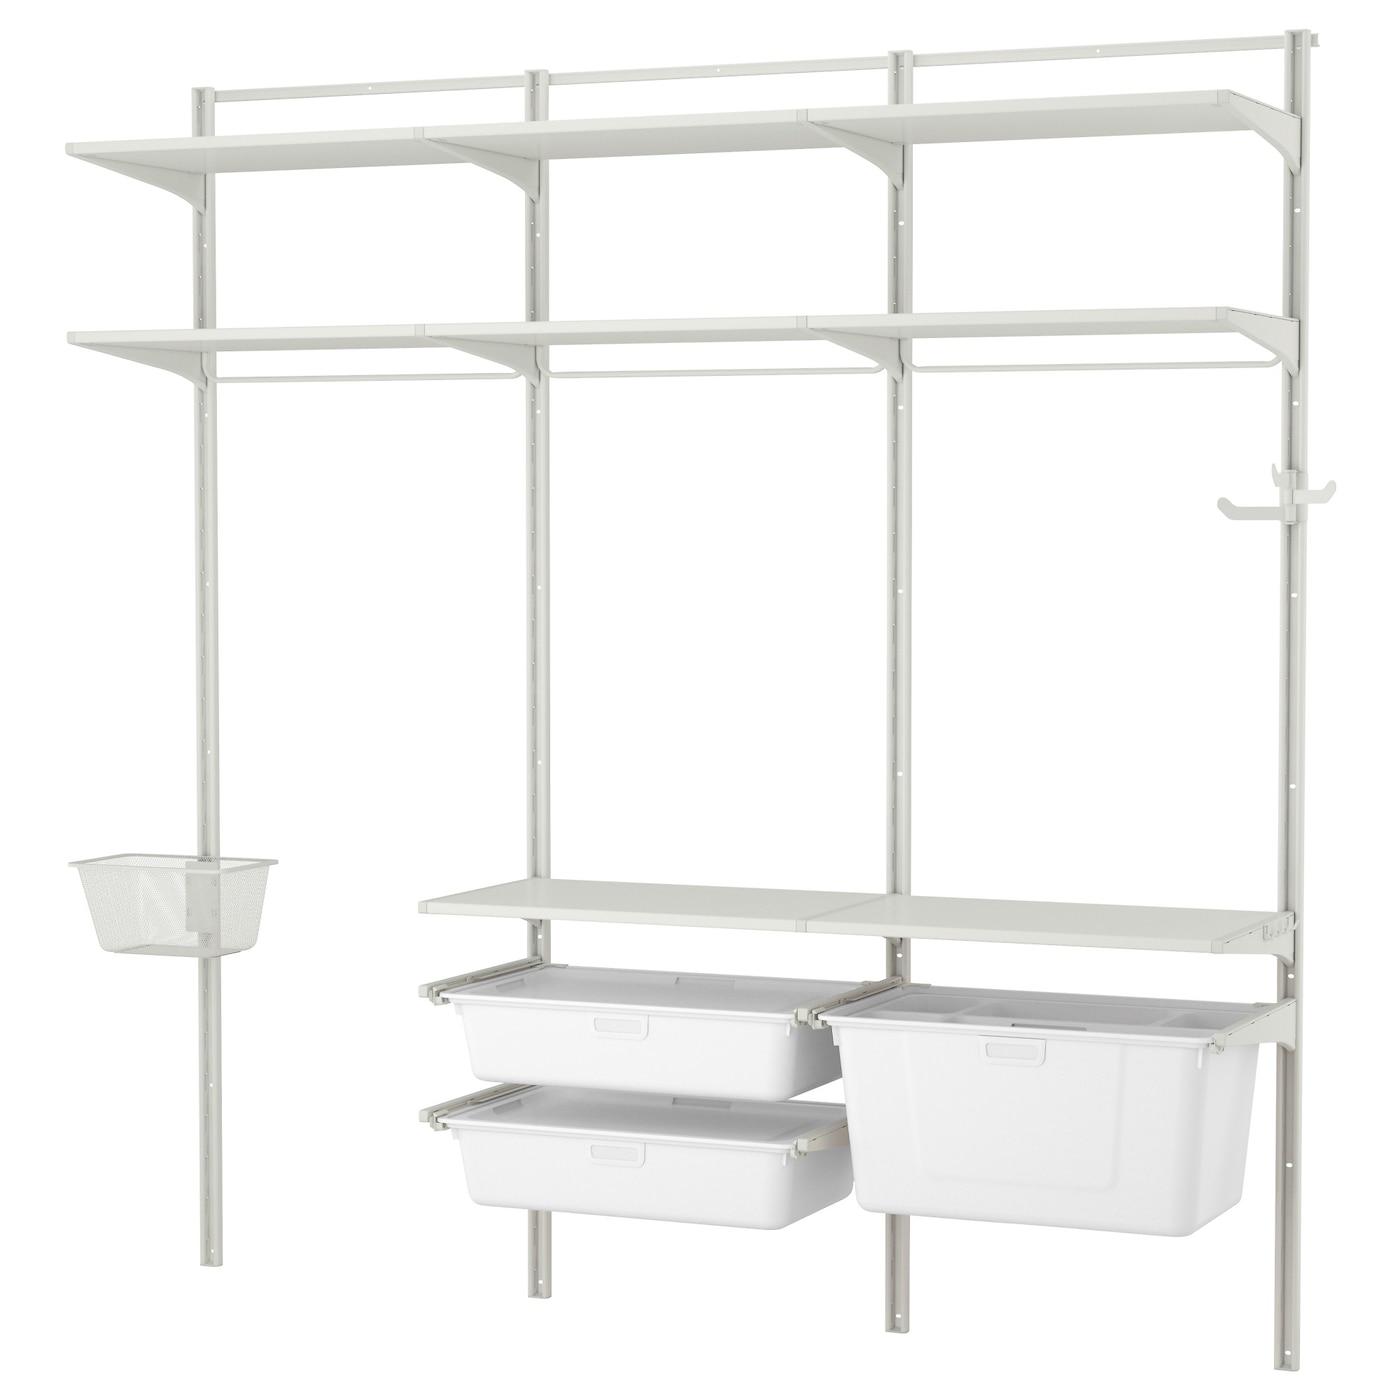 algot wall upright shelf triple hook white 212x41x199 cm coat hangers amp coat hooks ikea